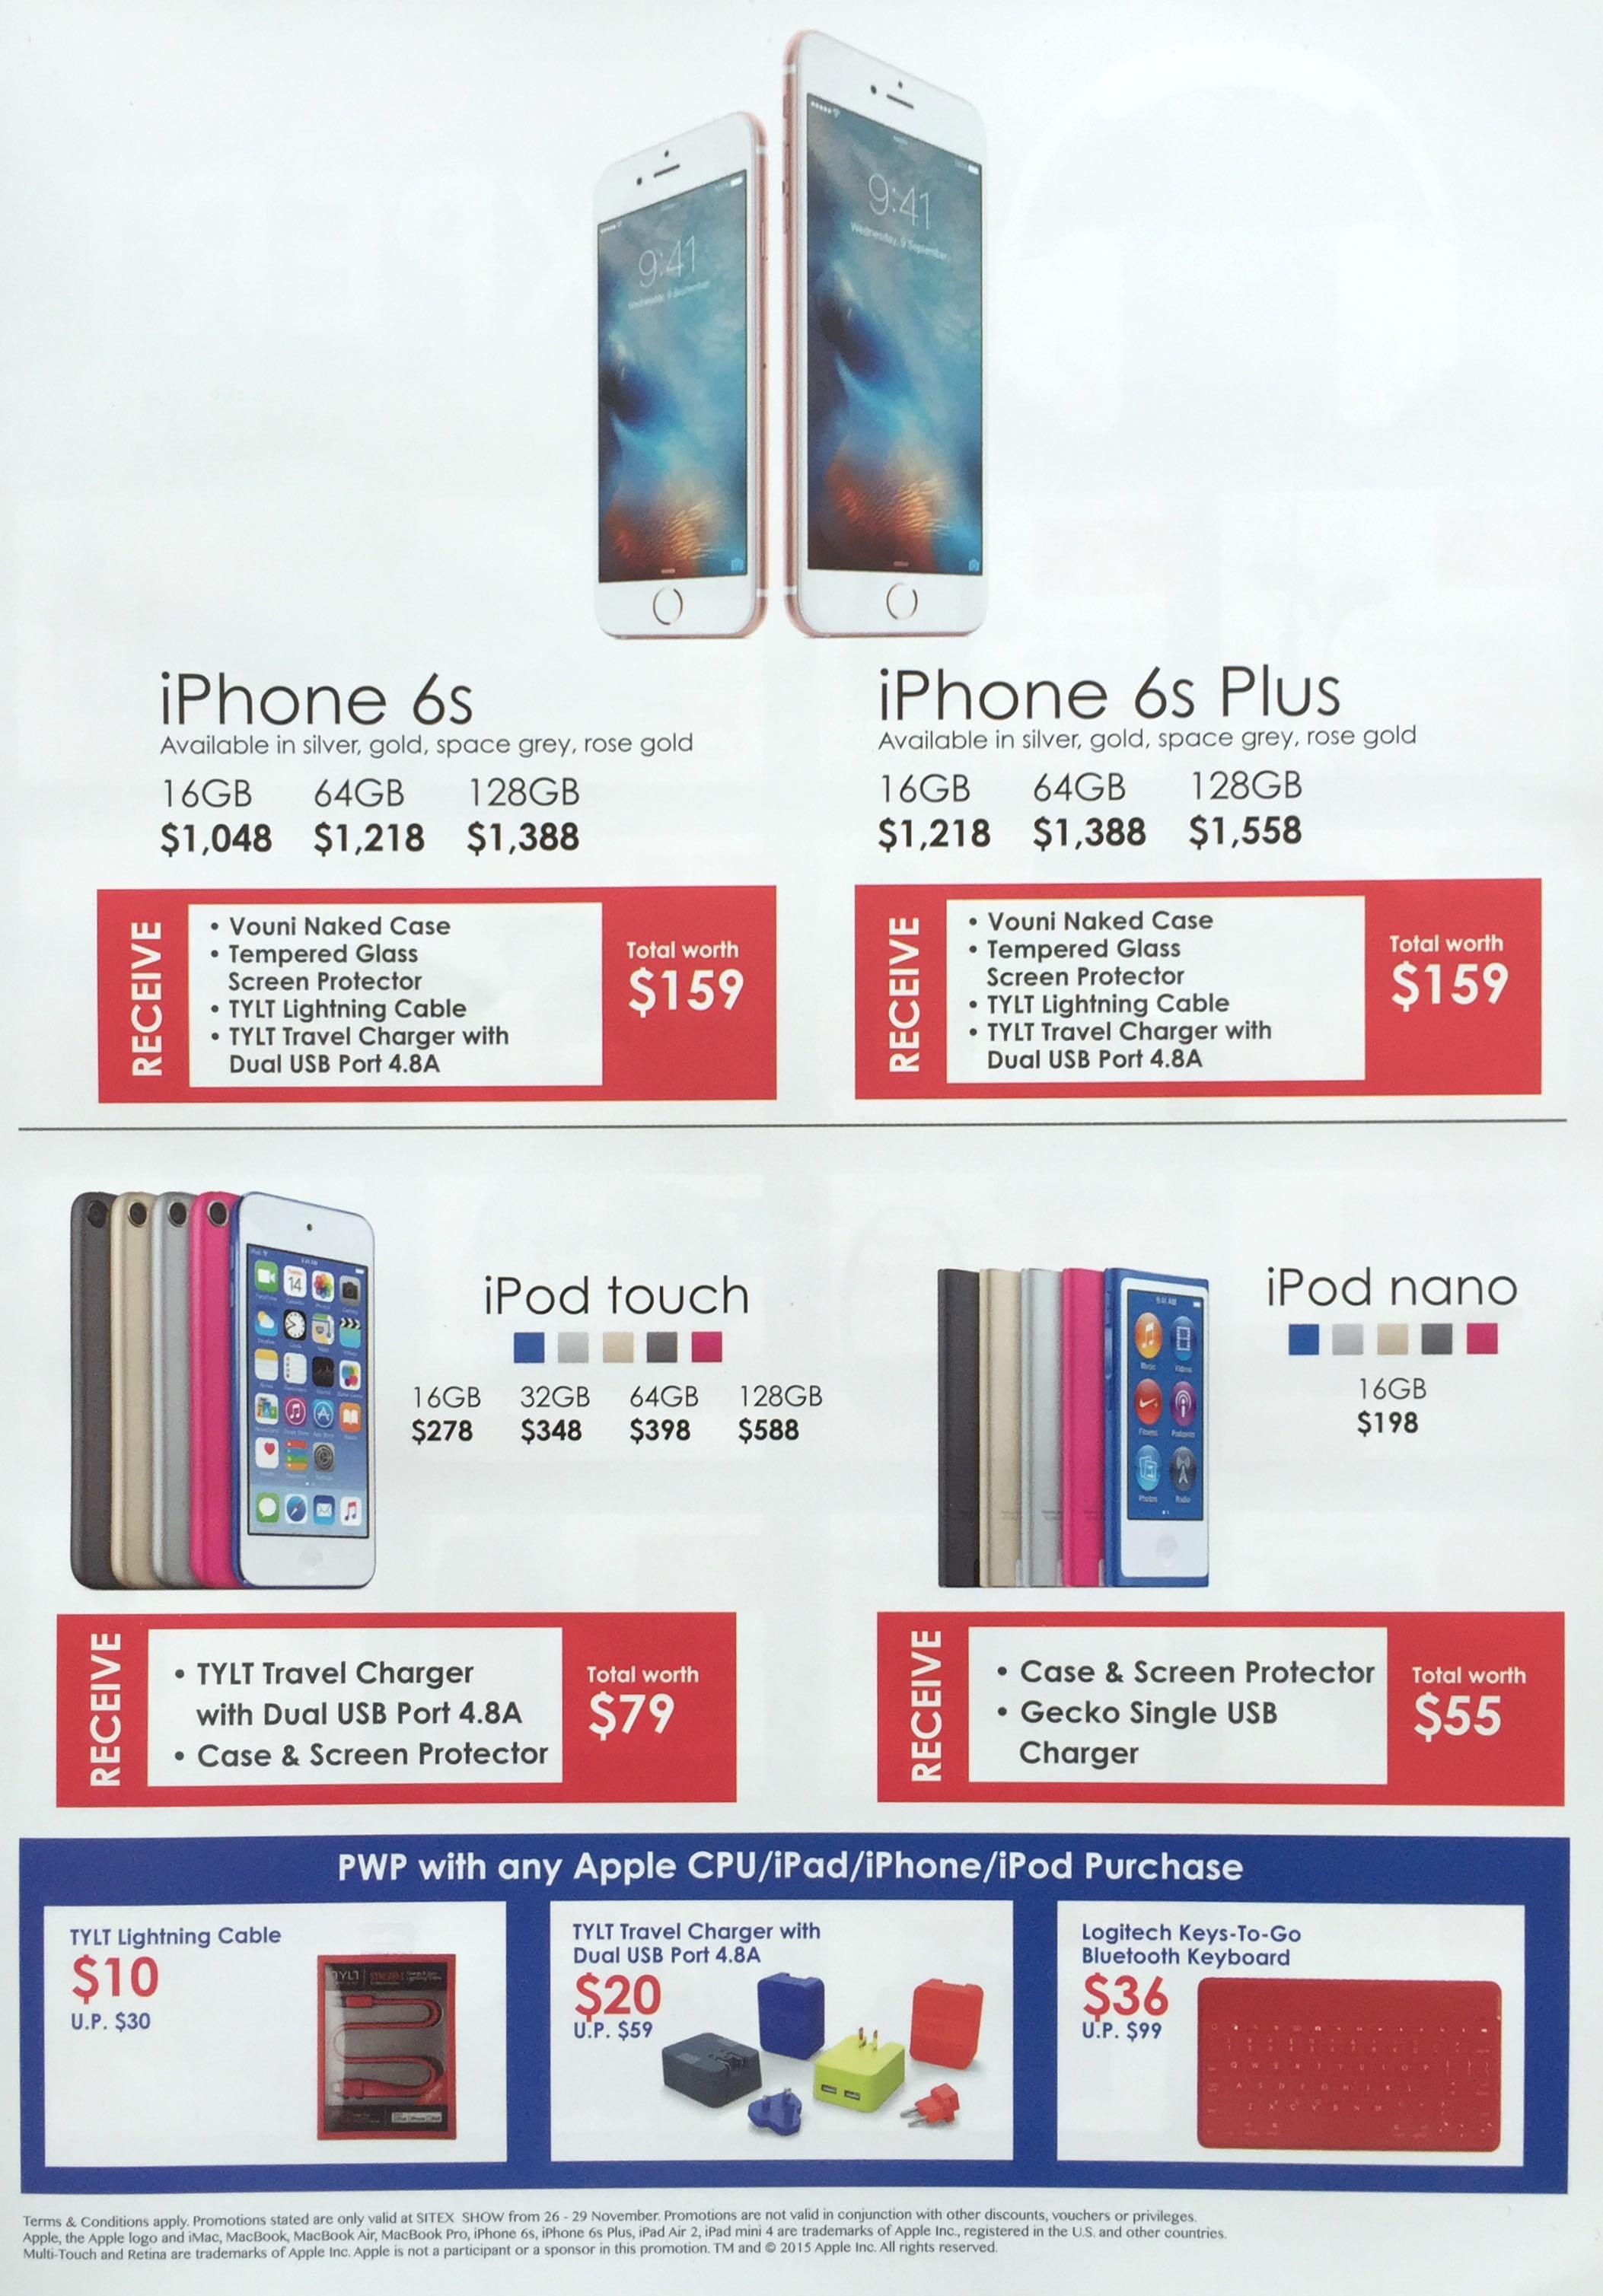 Best Denki @ SITEX 2015 - iPhone 6S / iPhone 6S Plus / iPod Touch / iPod Nano